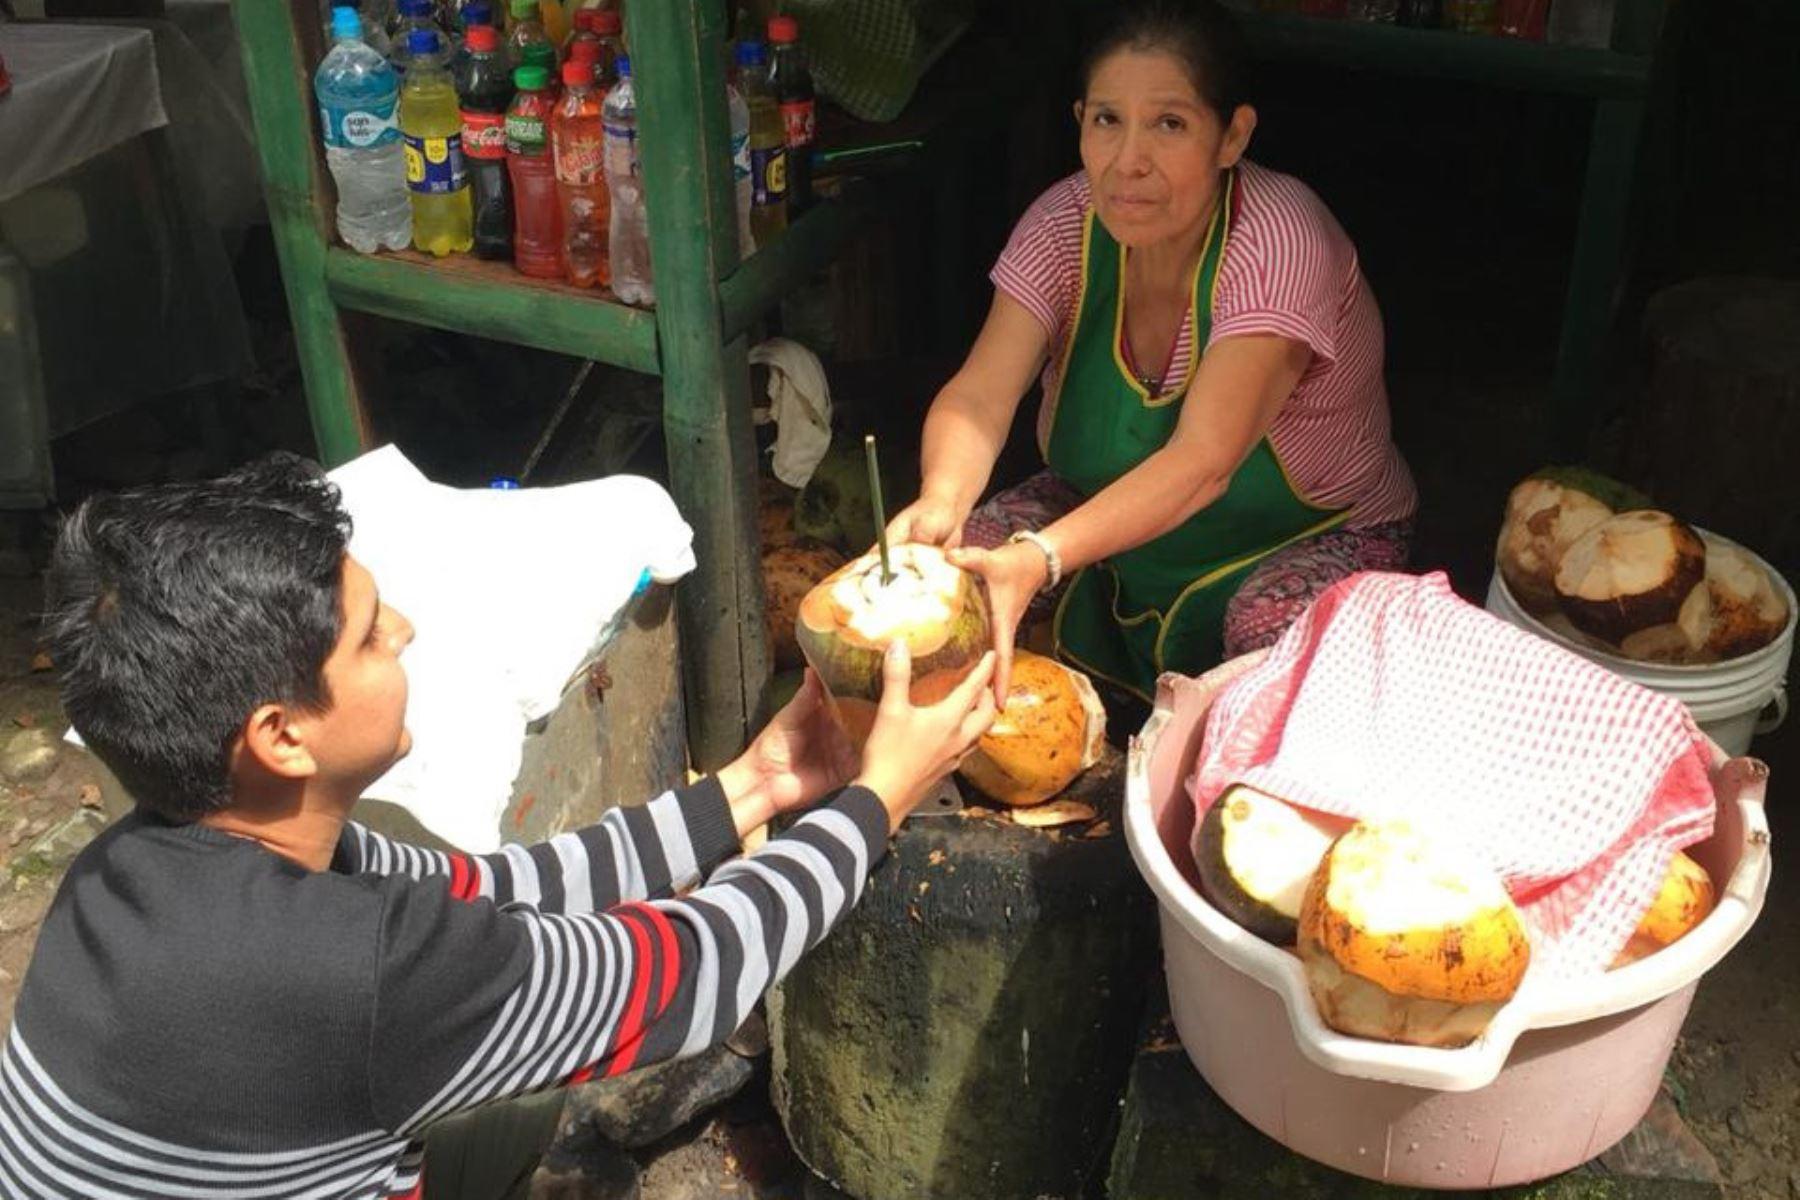 Cañitas de bambú reemplazan al plástico en Parque Nacional Tingo María. ANDINA/Difusión